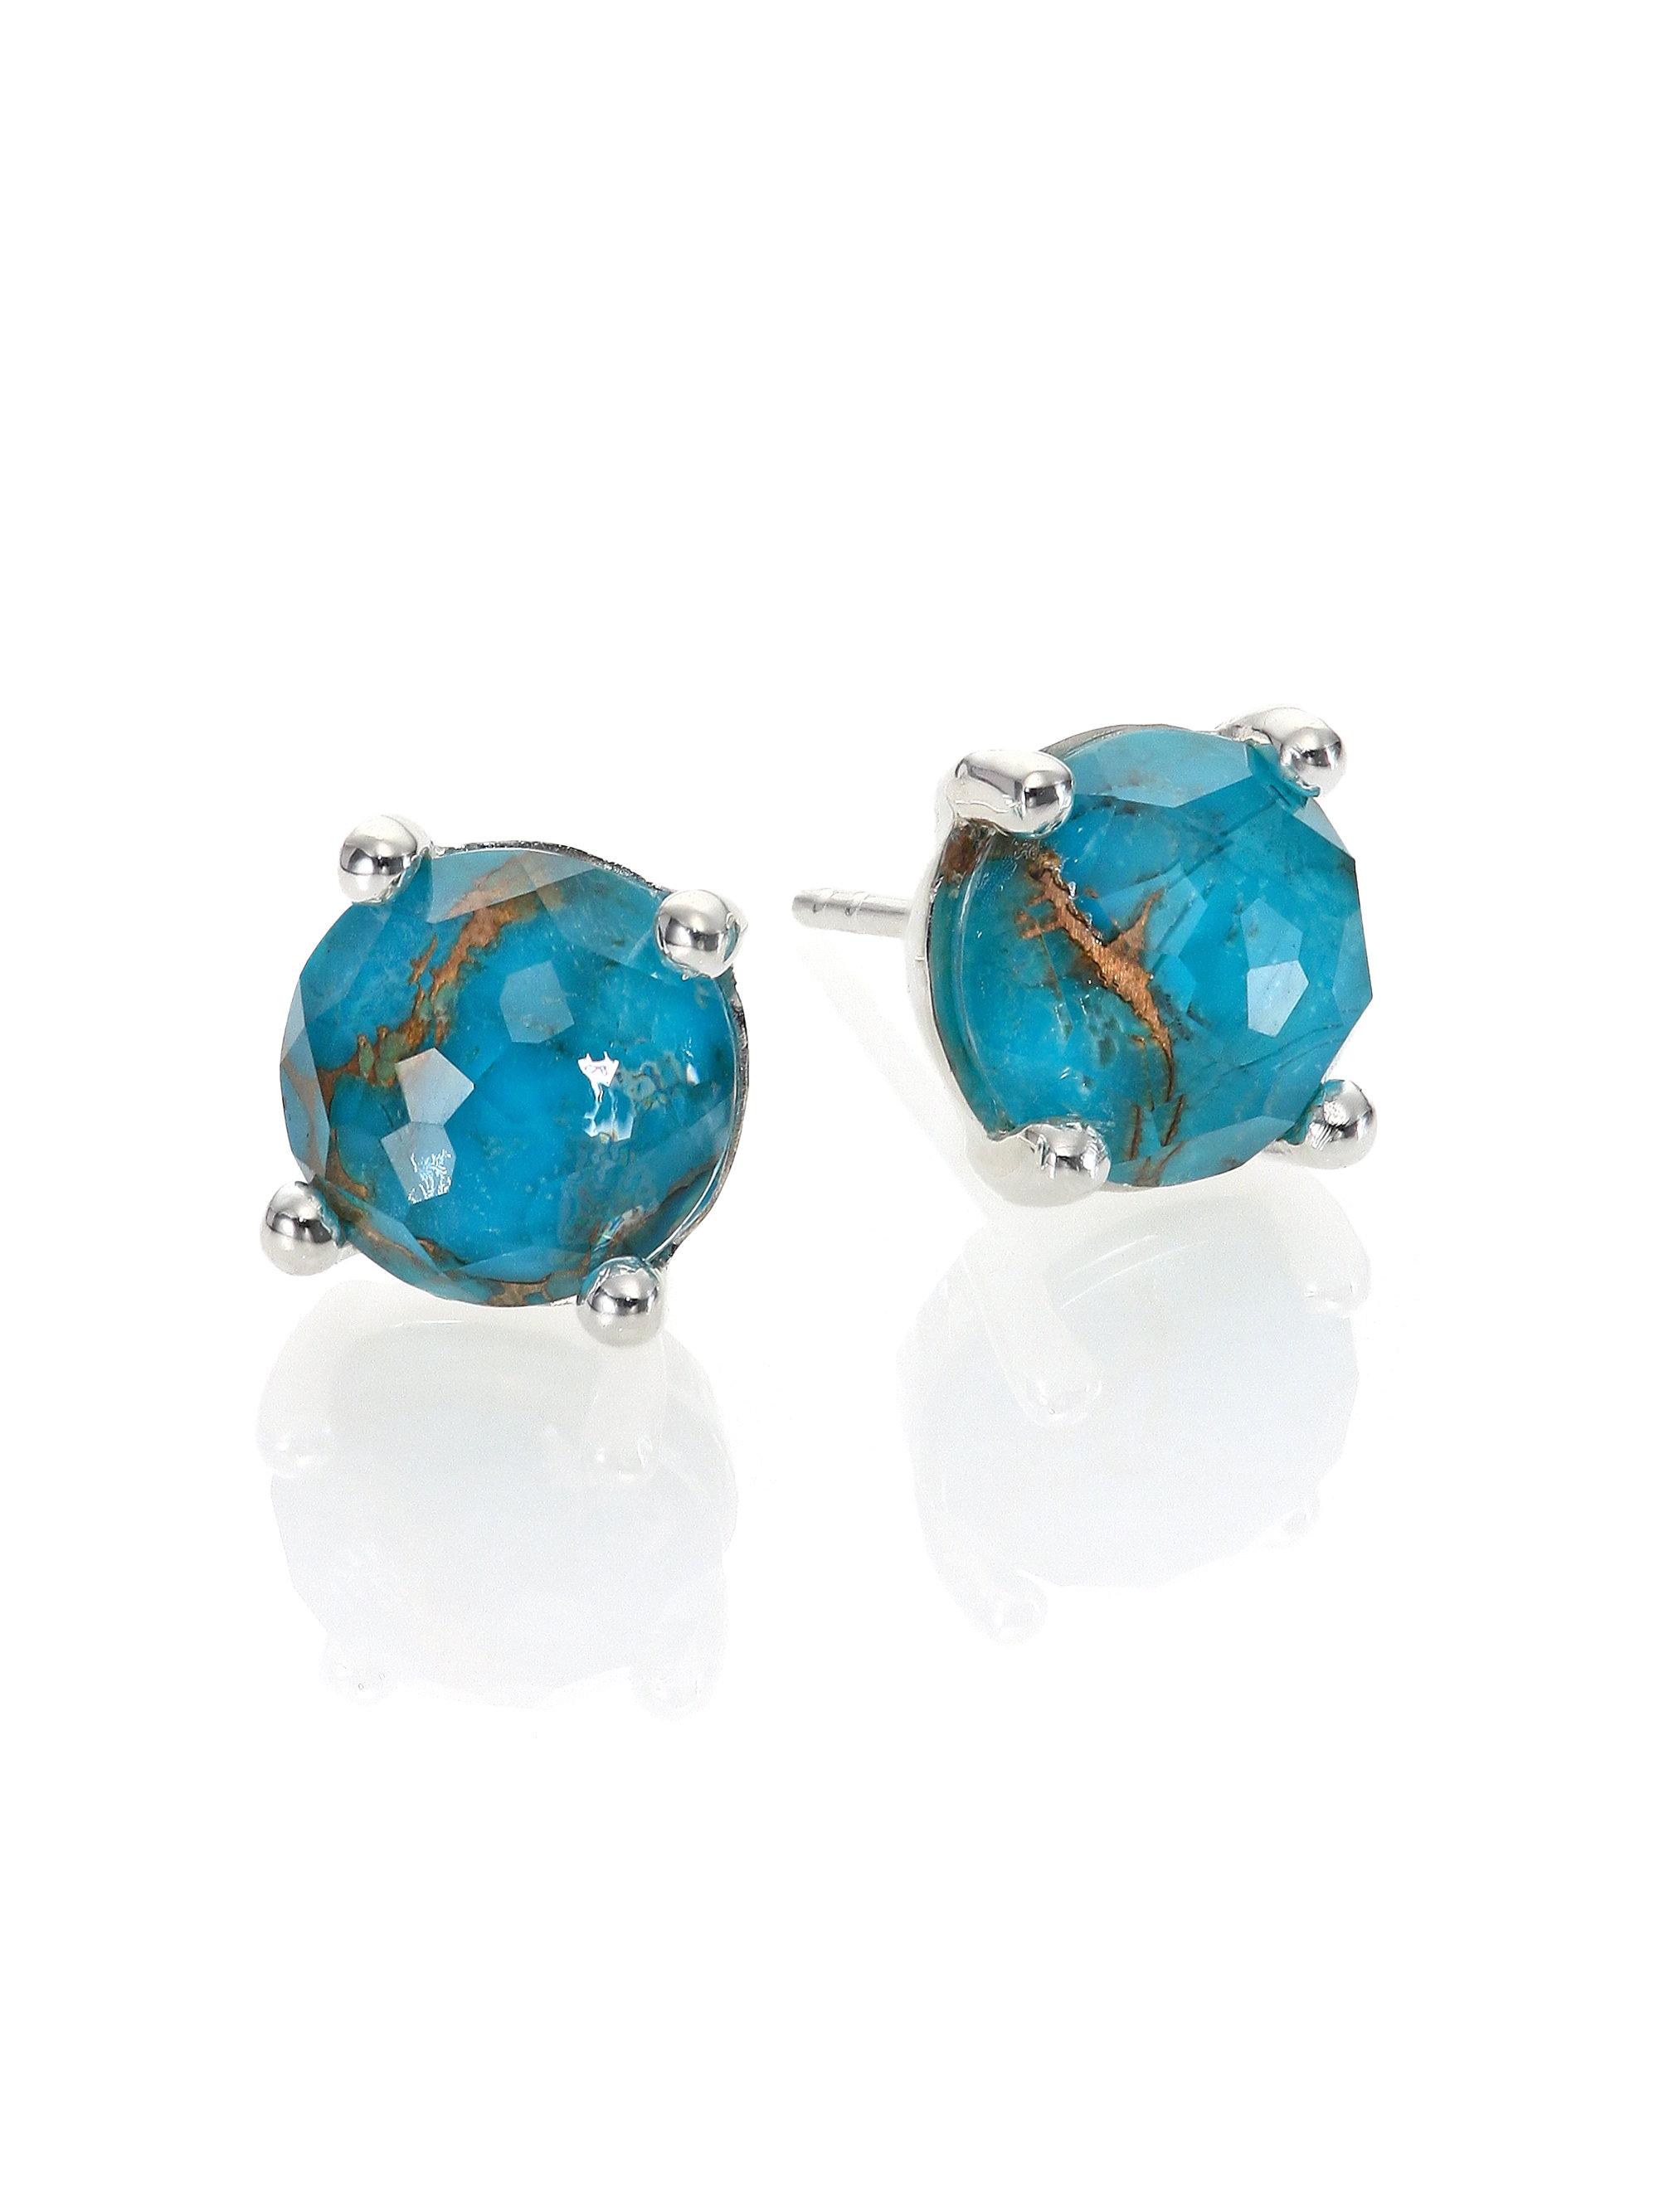 Ippolita Rock Candy Turquoise Stud Earrings IMcTjR